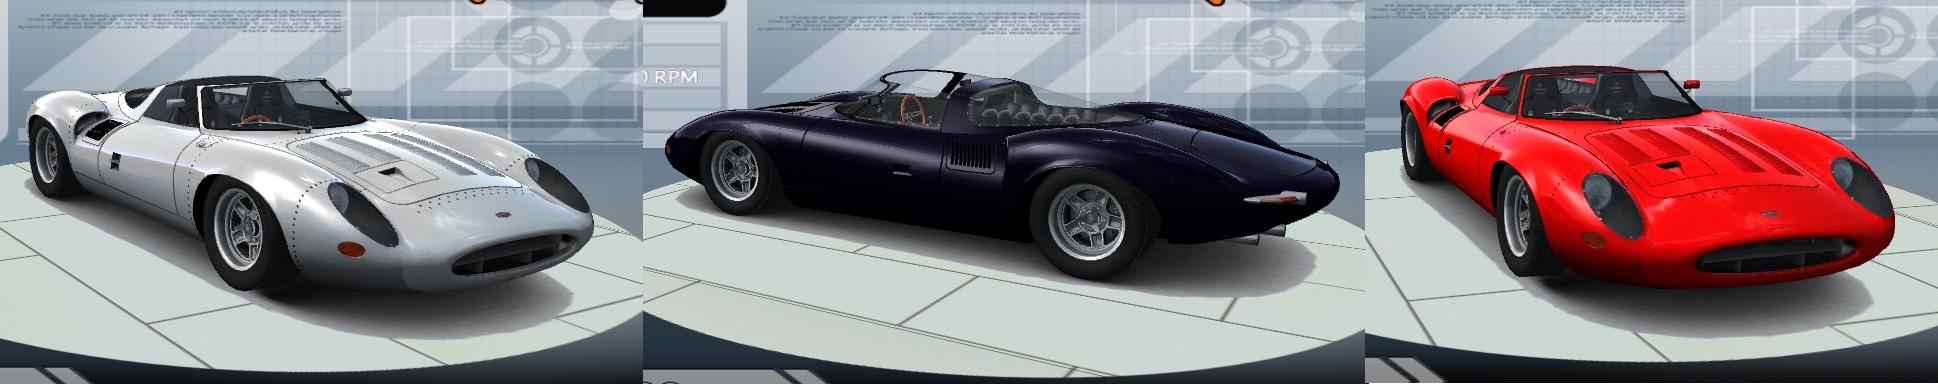 Jaguar XJ13 1966 - Page 3 18486969_iO7tq